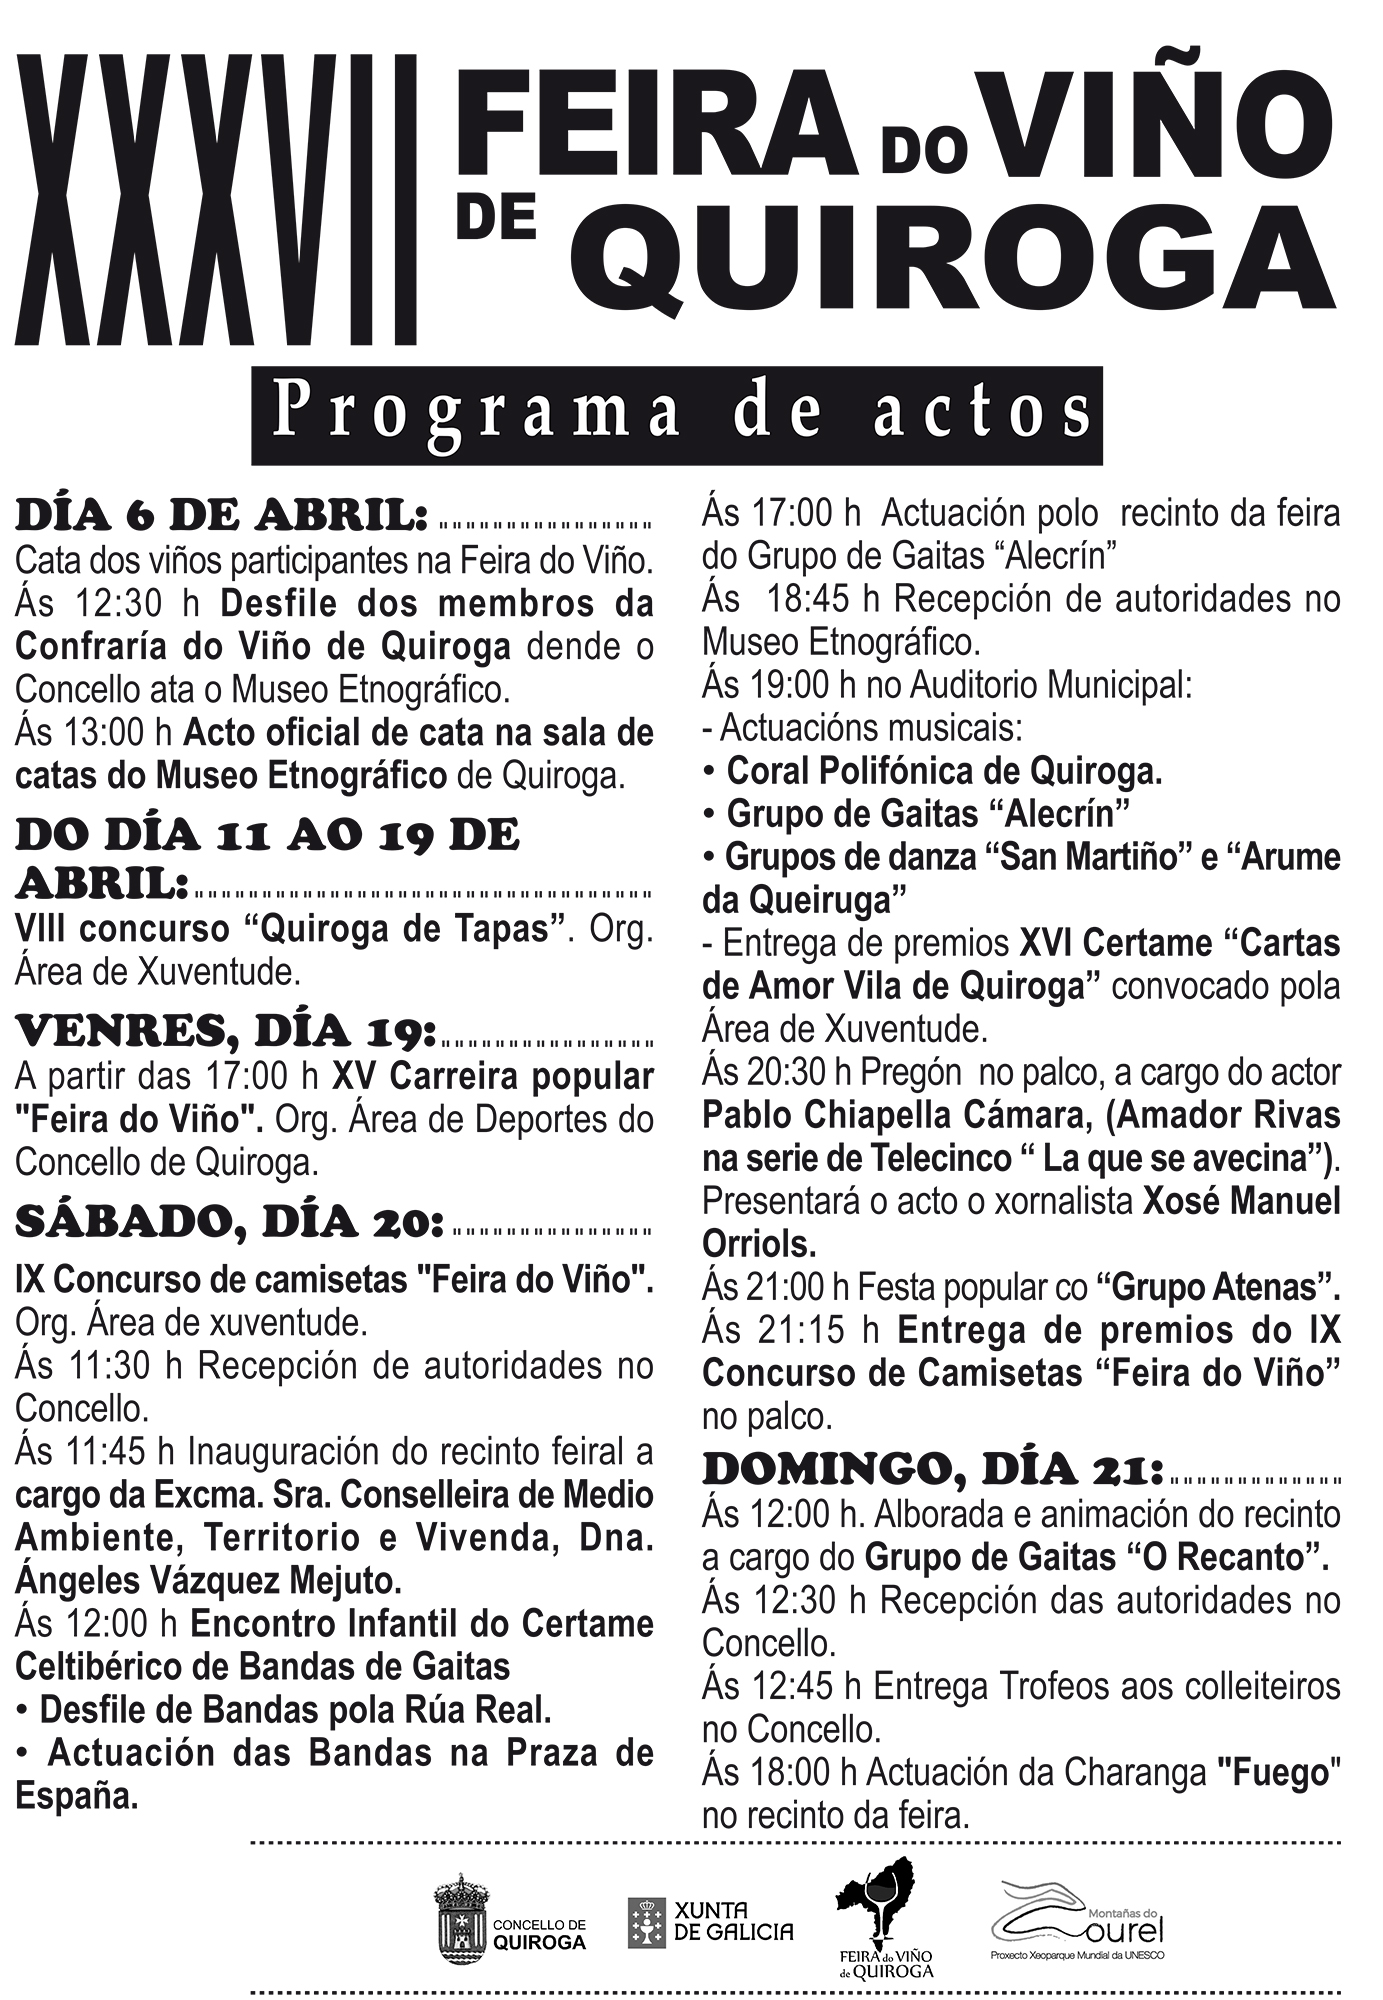 Cartel de la XXXVII Feria del vino de Quiroga